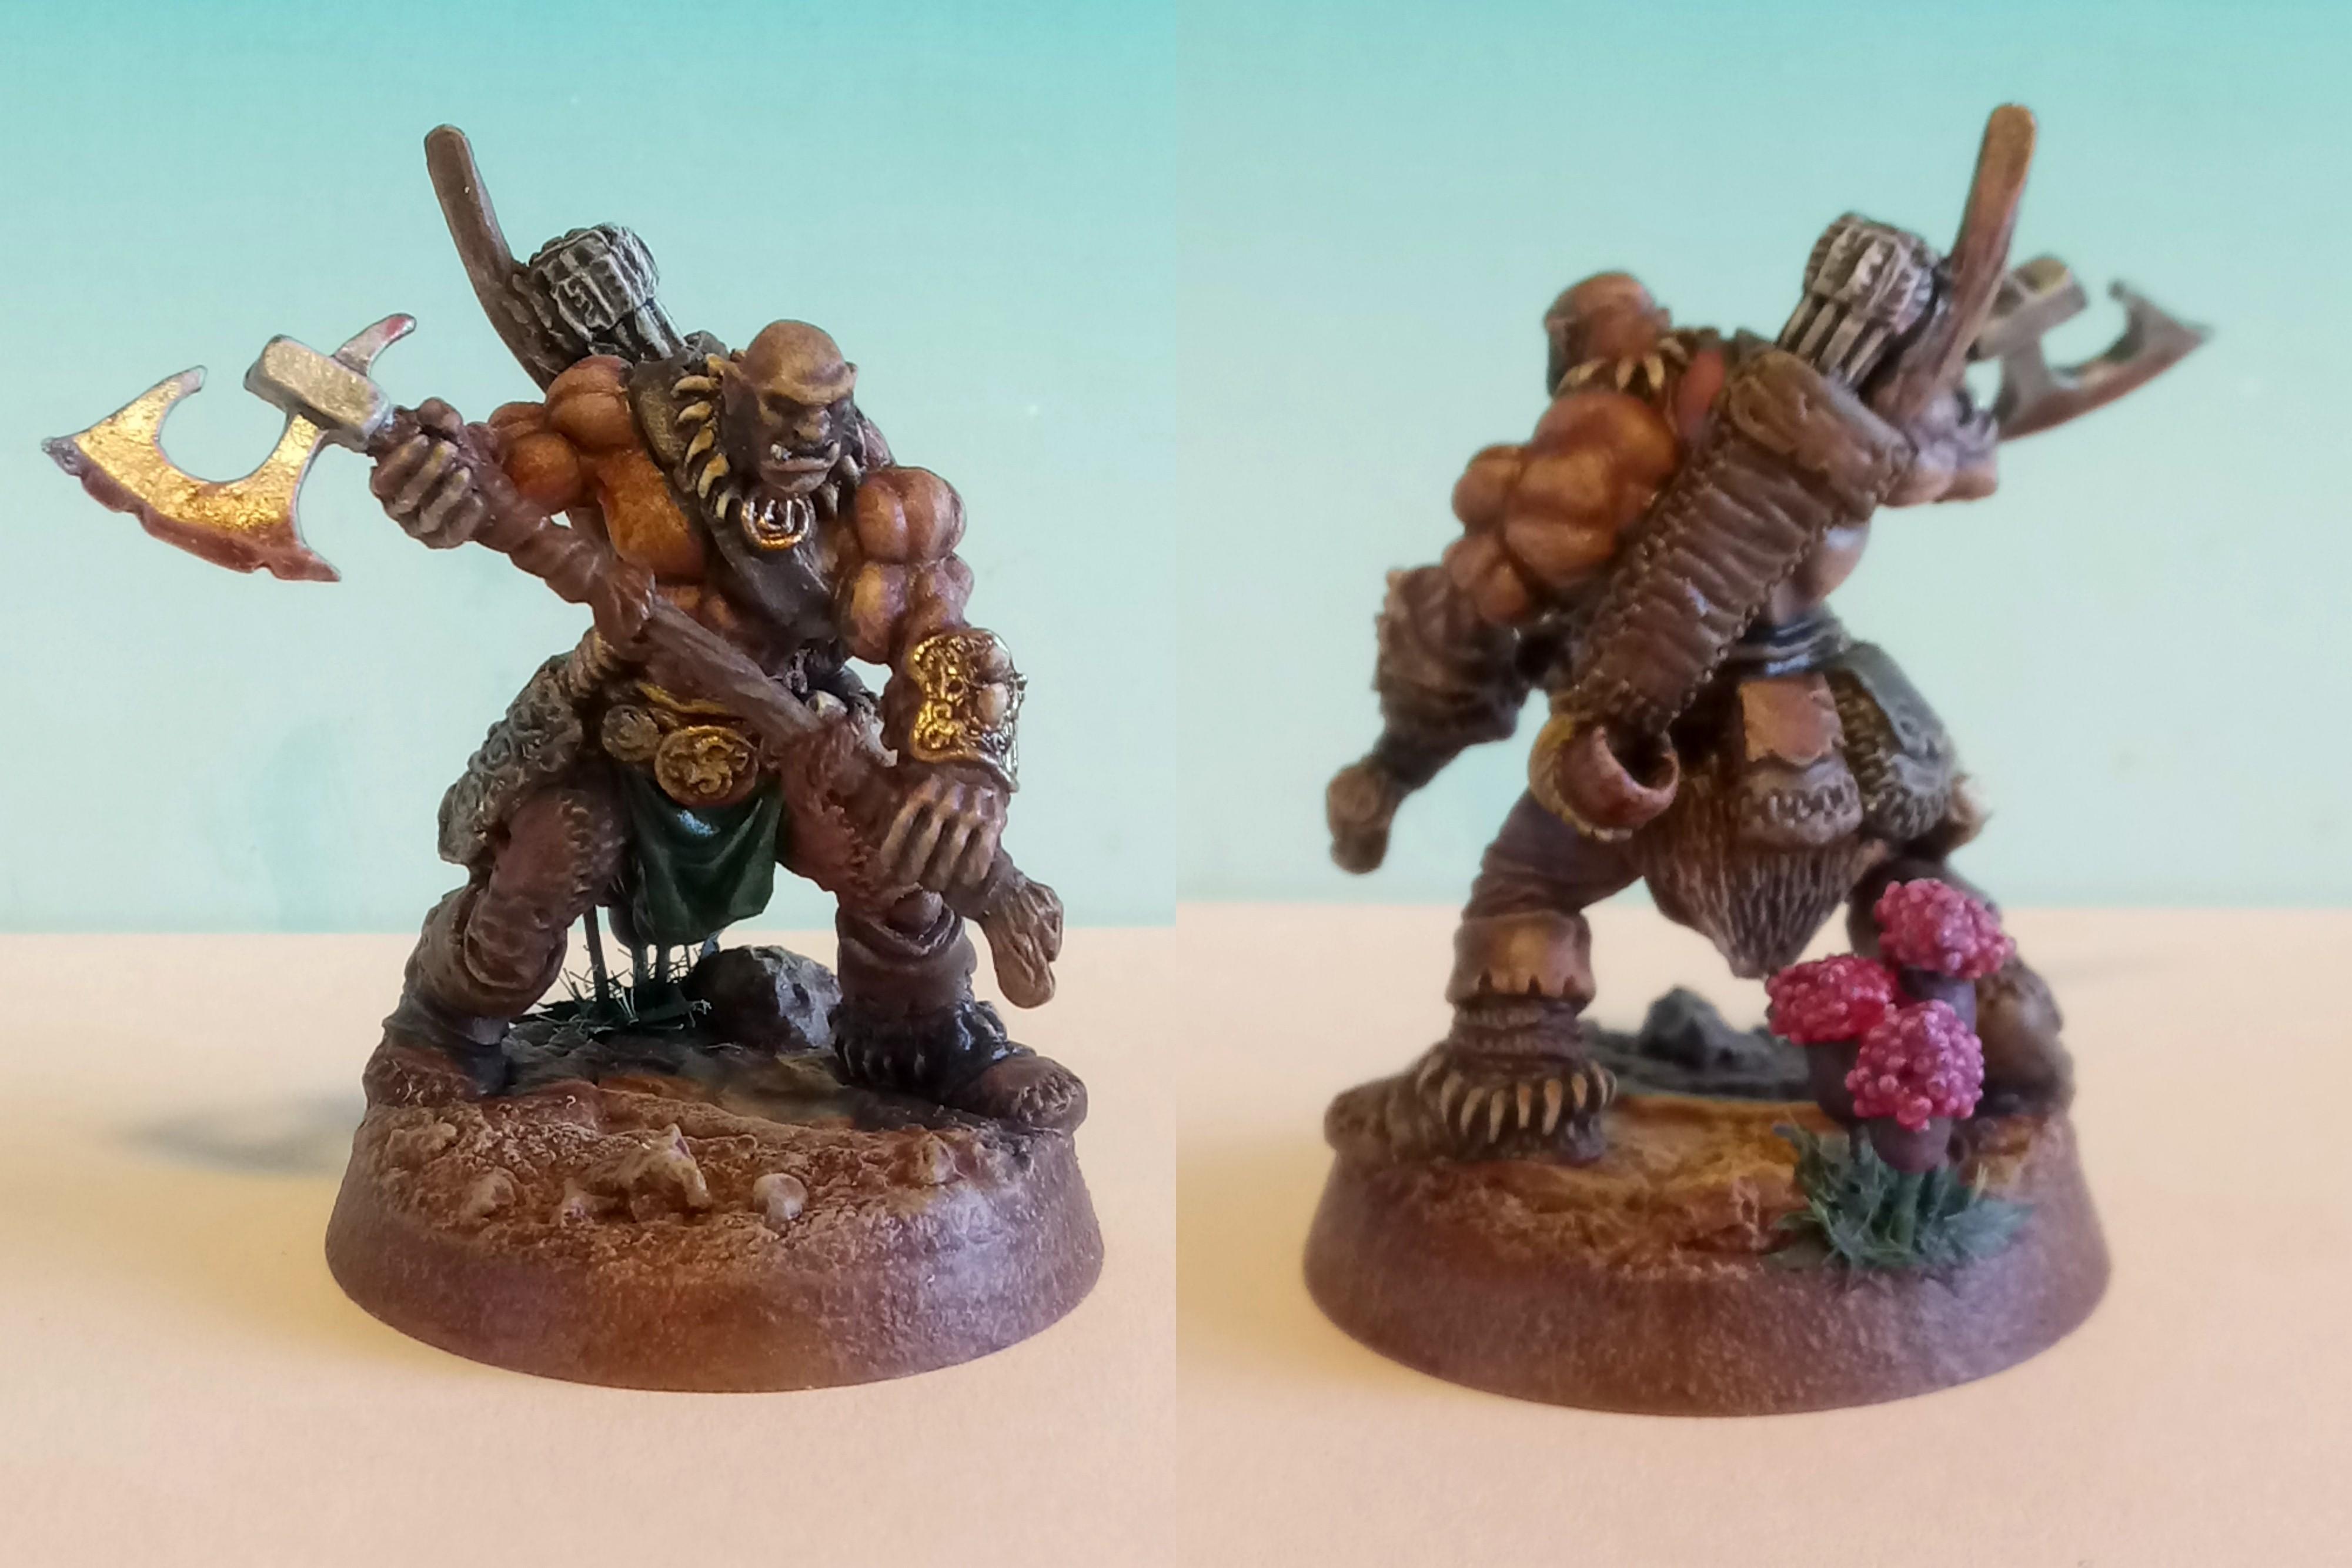 Reaper Miniatures - Thelgar Halfblood, Half-Orc Barbarian